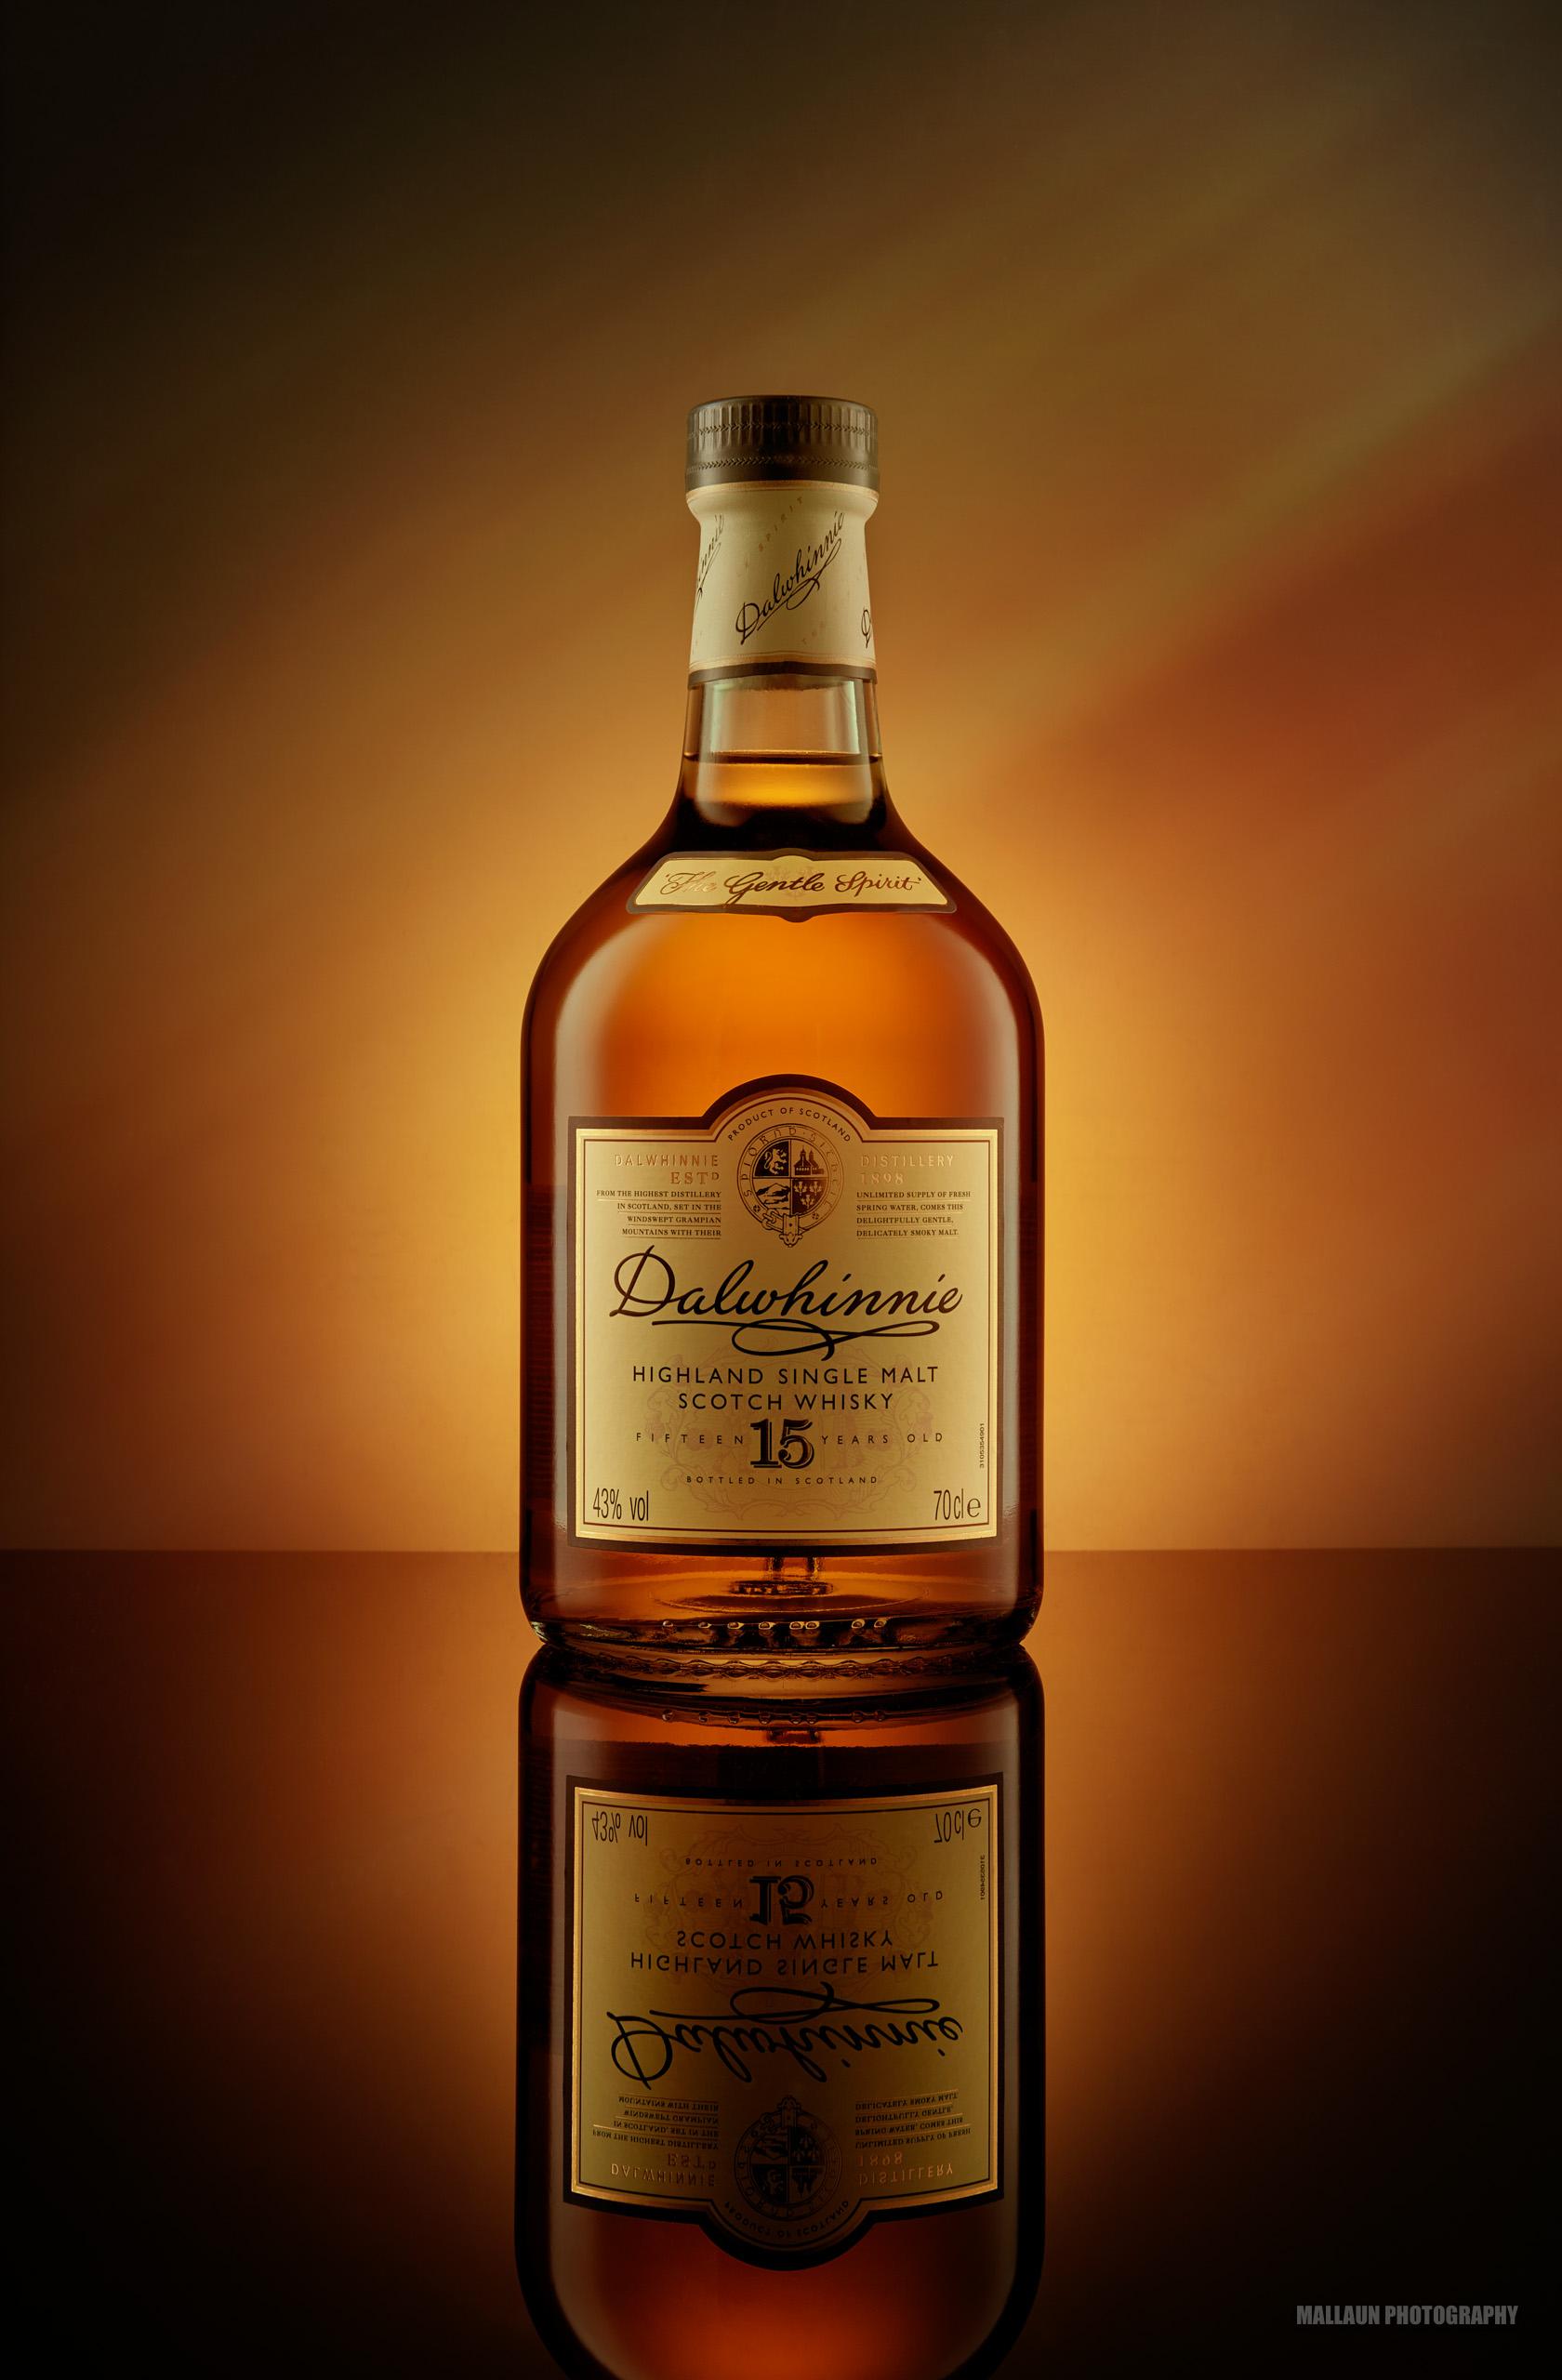 Dalwhinnie Scotch Whisky - 15 Year Old dark background studio photography